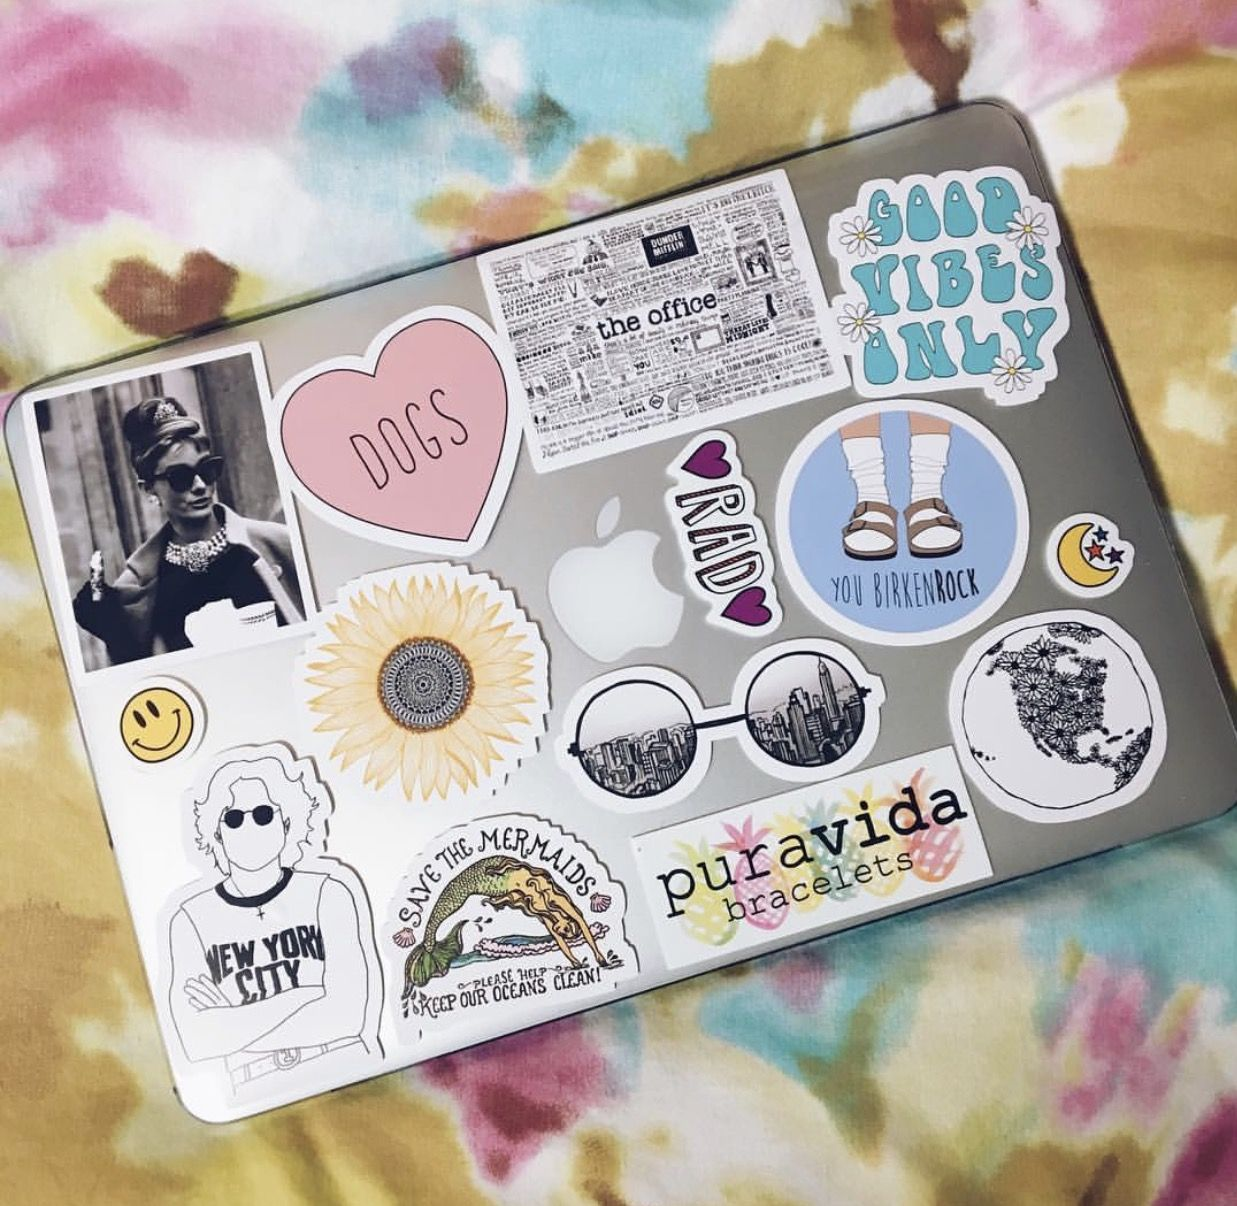 pinterest⚽️ MRooten14 Computer sticker, Phone case